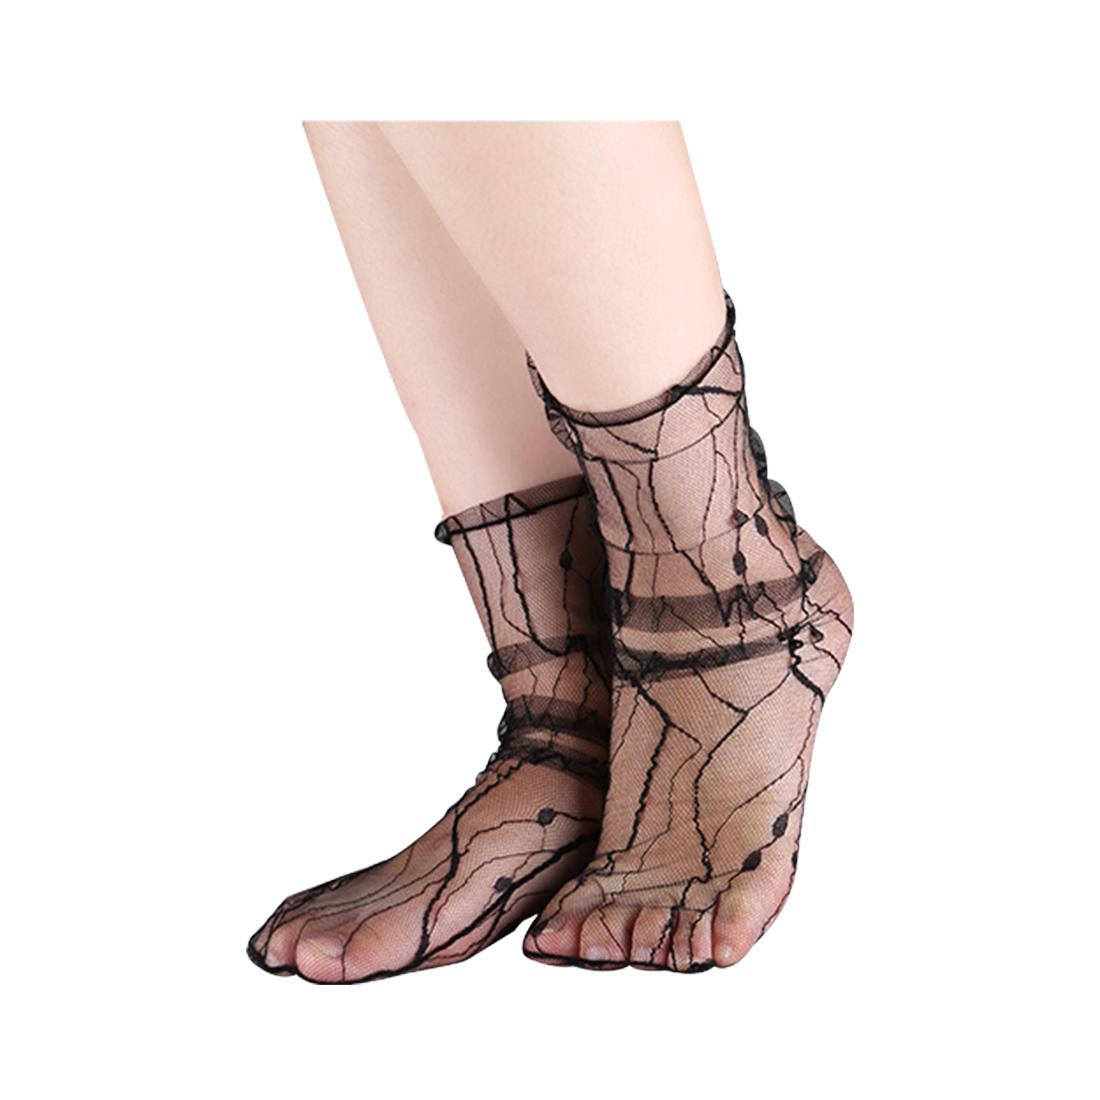 Women 10 Packs Lace Translucent Breathable Ankle High Sheer Socks Ripple Black